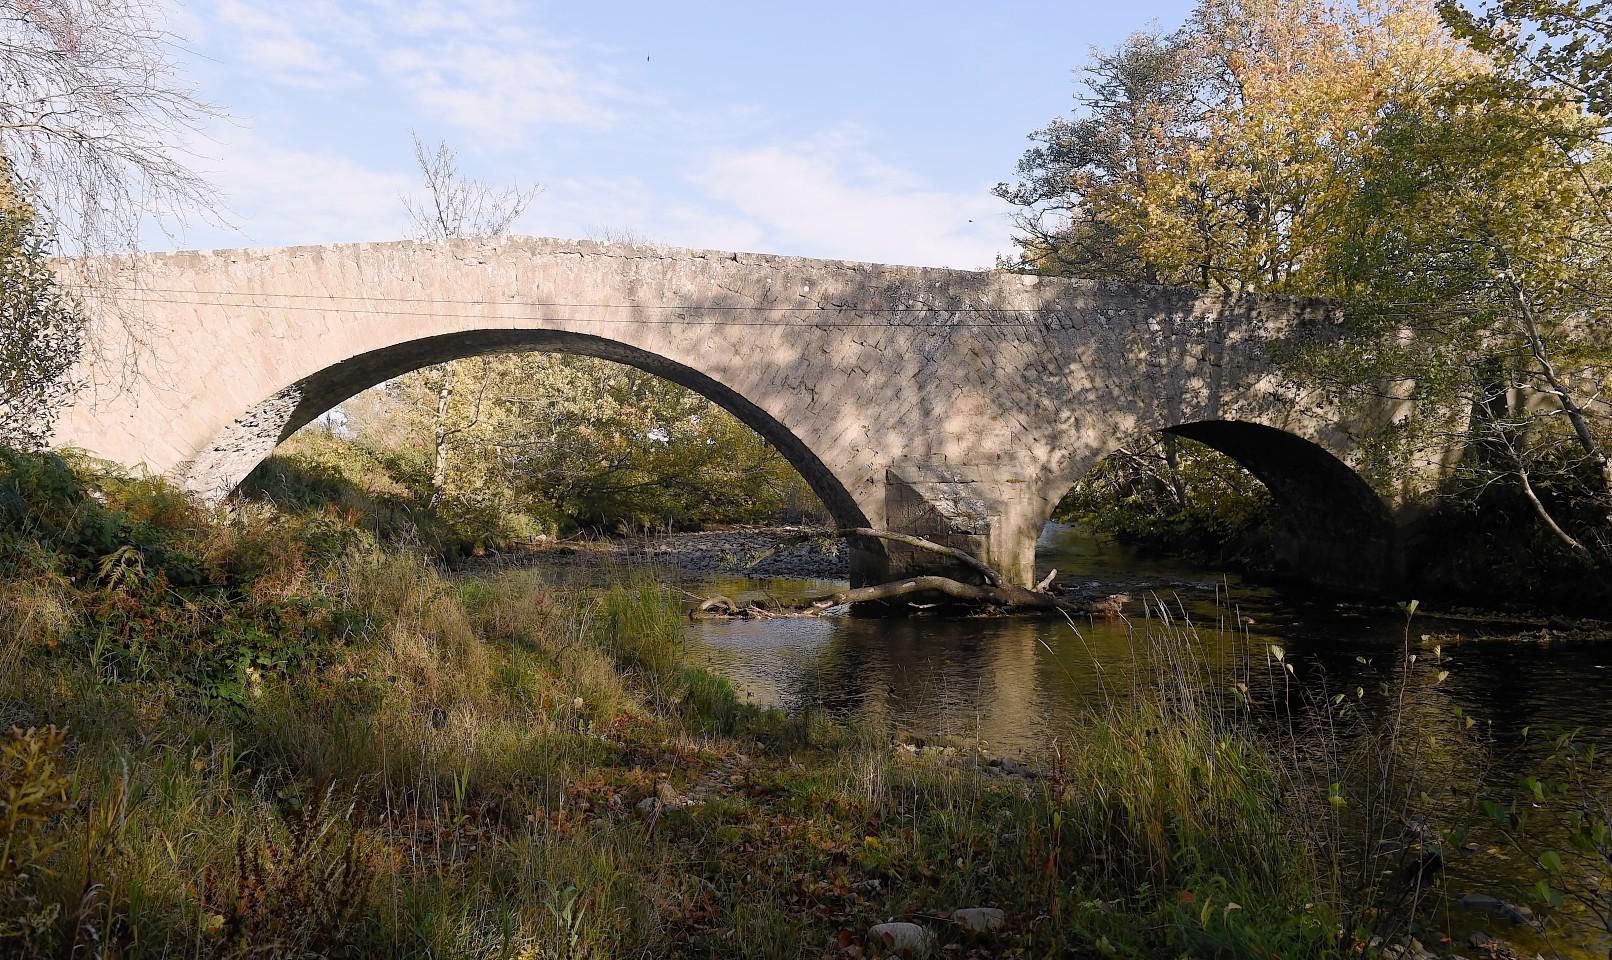 The White Bridge between Clephanton and Cawdor